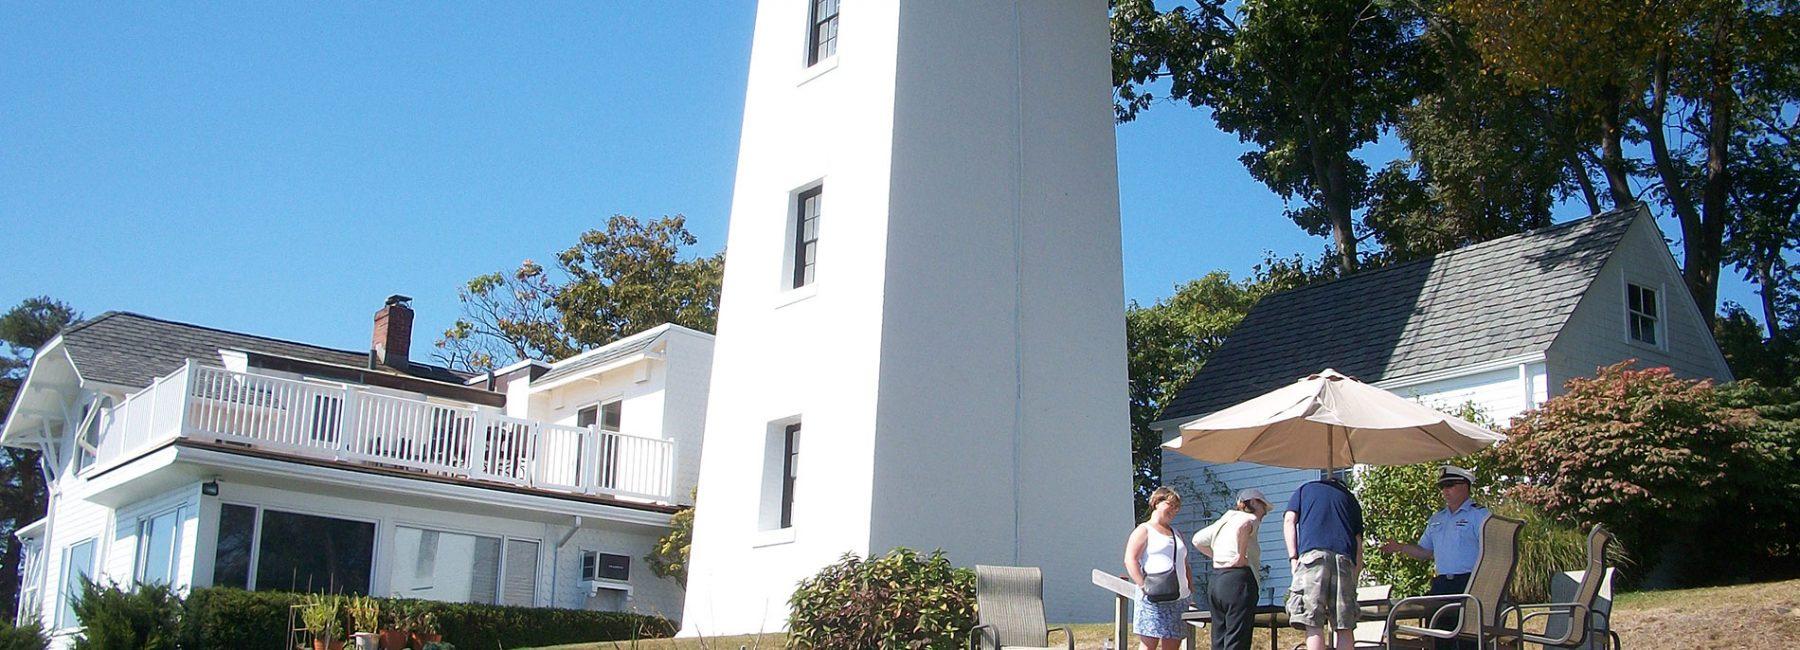 Hospital Point Lighthouse Open House